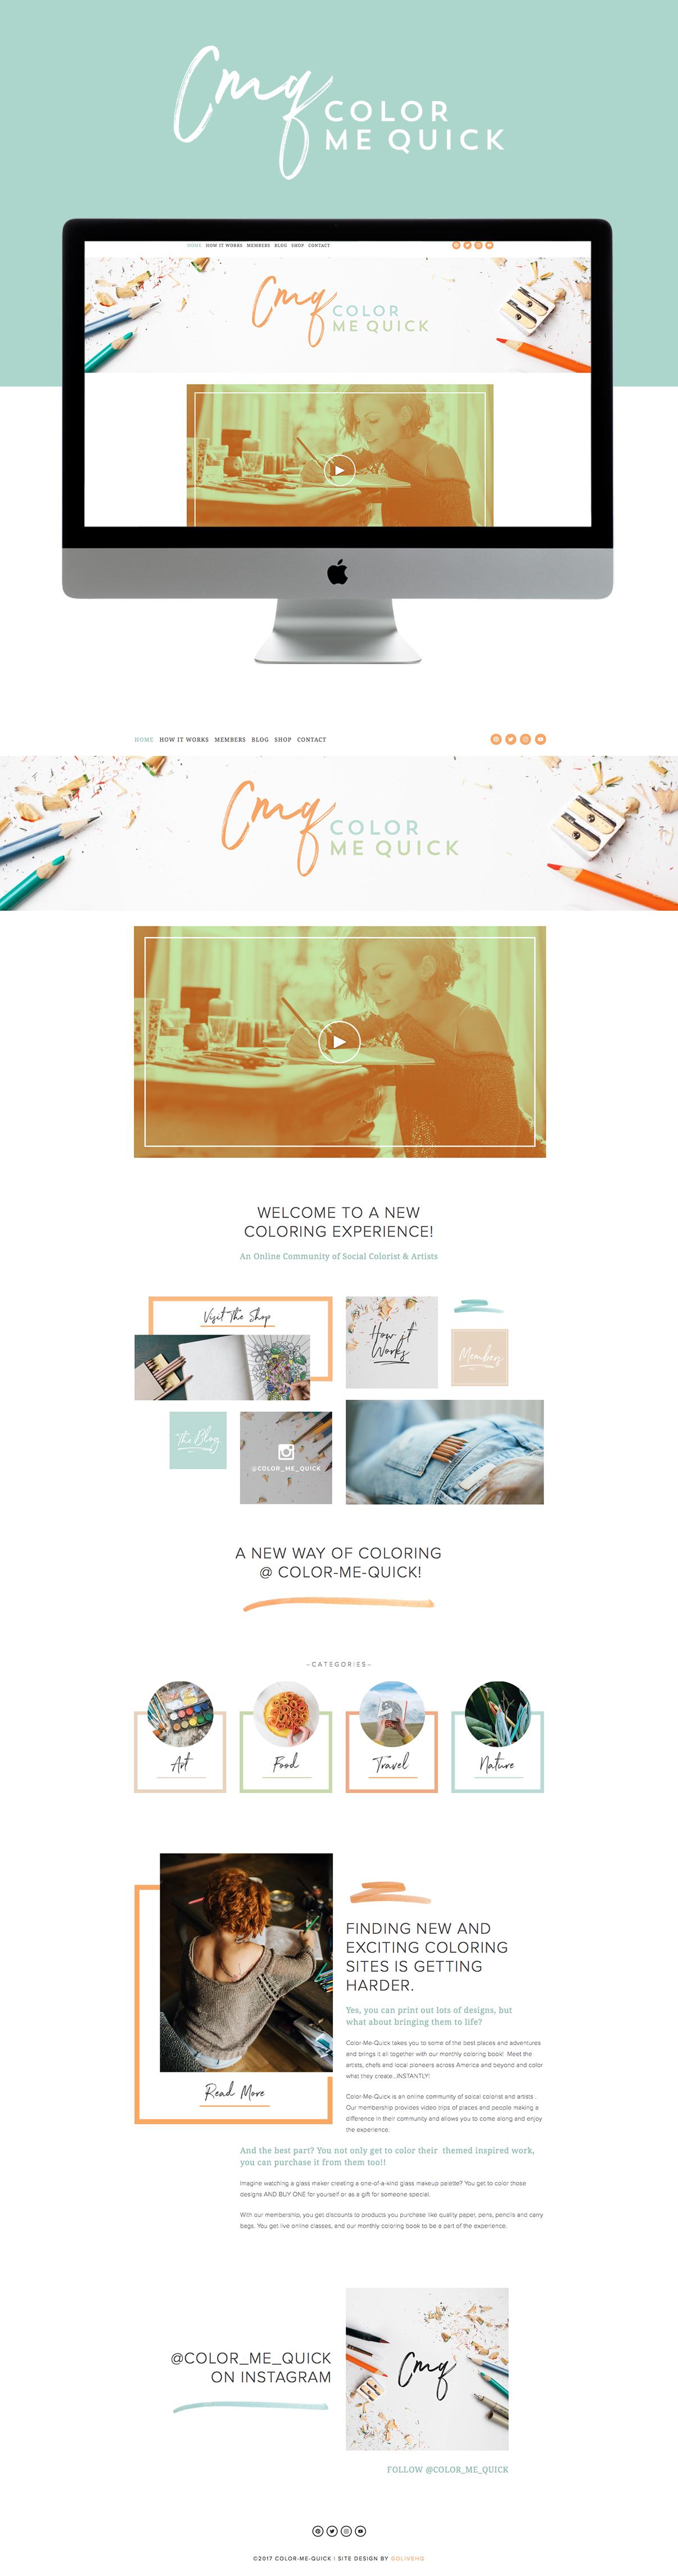 colorful, playful & mature Squarespace website design | designed by: golivehq.co